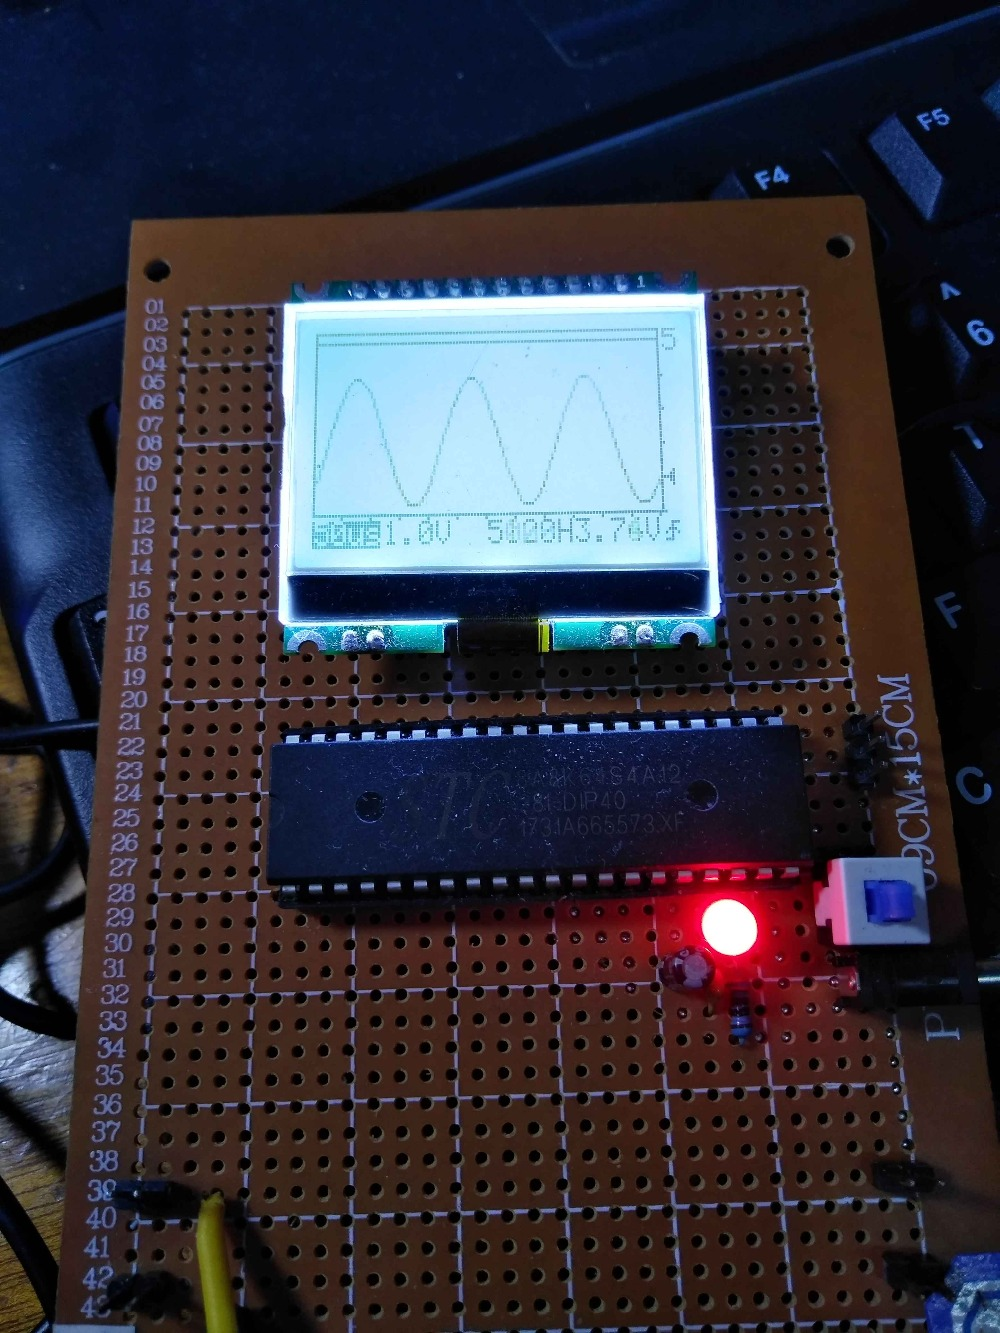 Design of Single-chip Microcomputer Course Based on 51 Single Chip Microcomputer Oscilloscope цена и фото